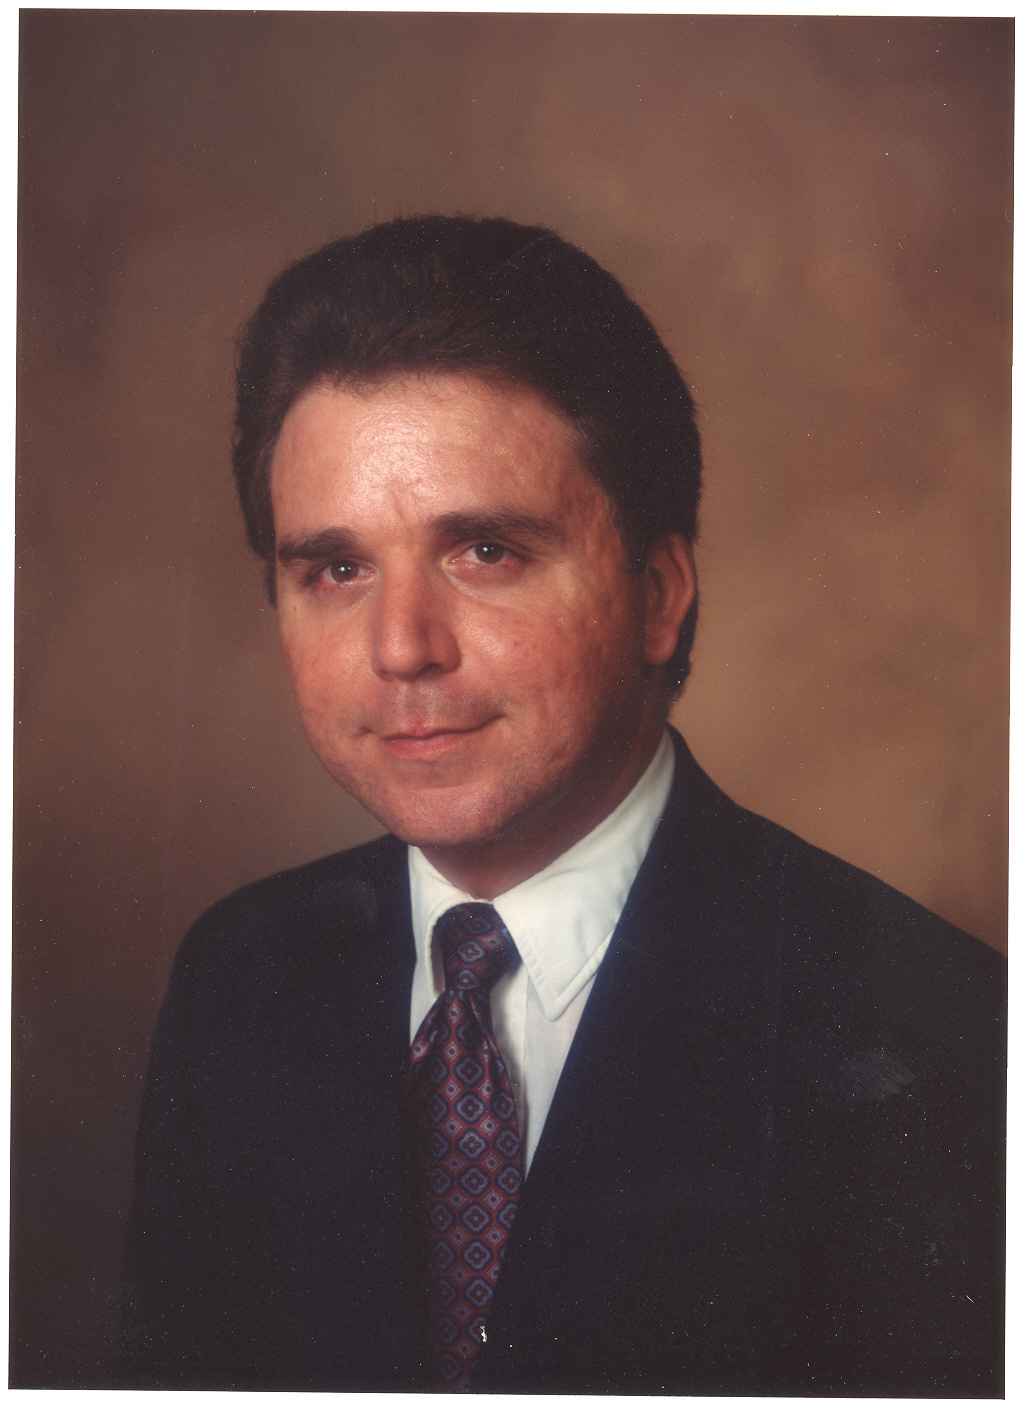 Marcelino Dodge, EA - Tax Preparer - Tax Professionals